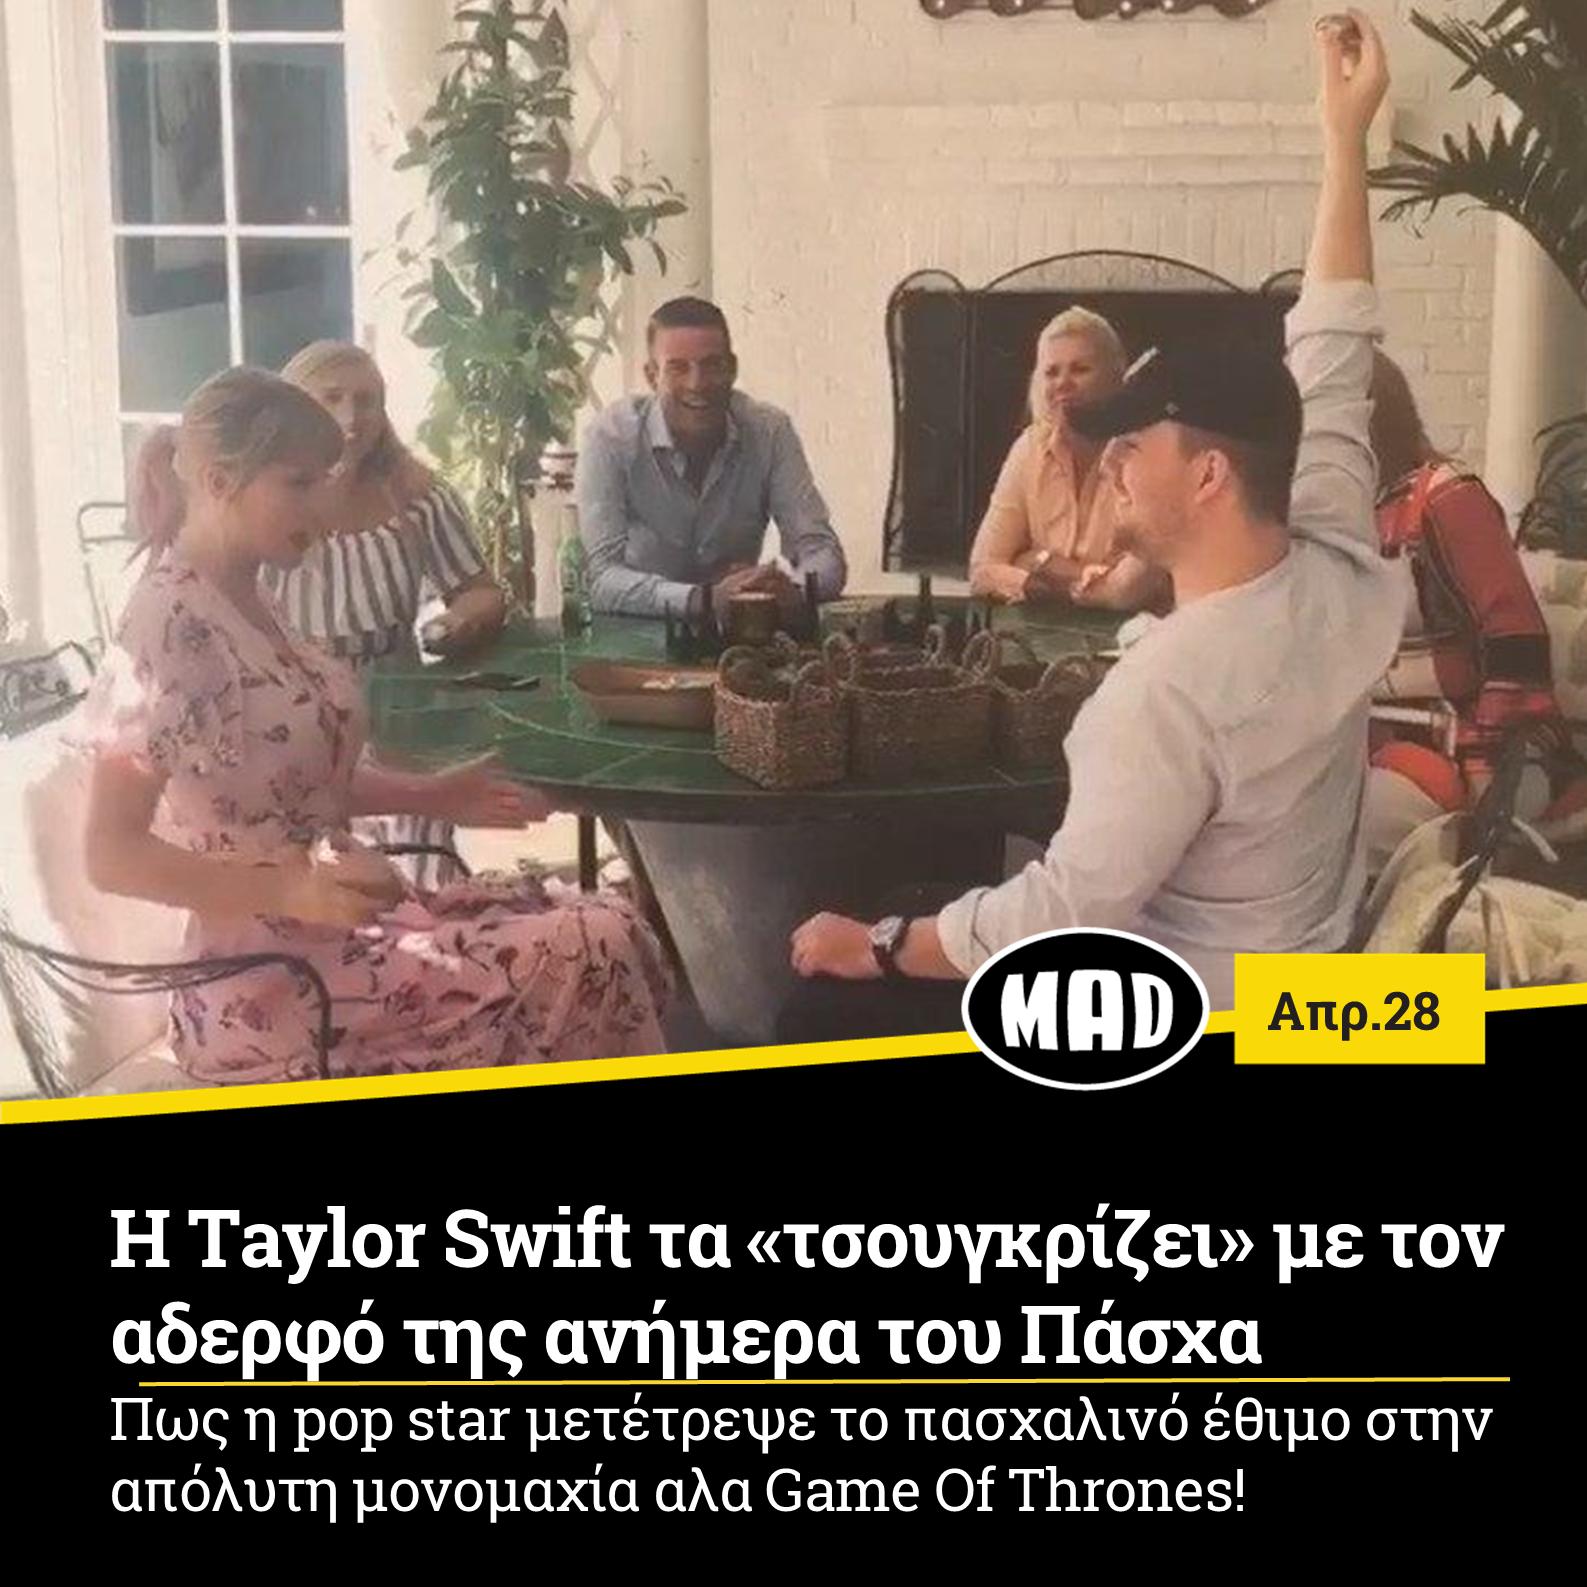 H Taylor Swift τα «τσουγκρίζει» με τον αδερφό της ανήμερα του Πάσχα